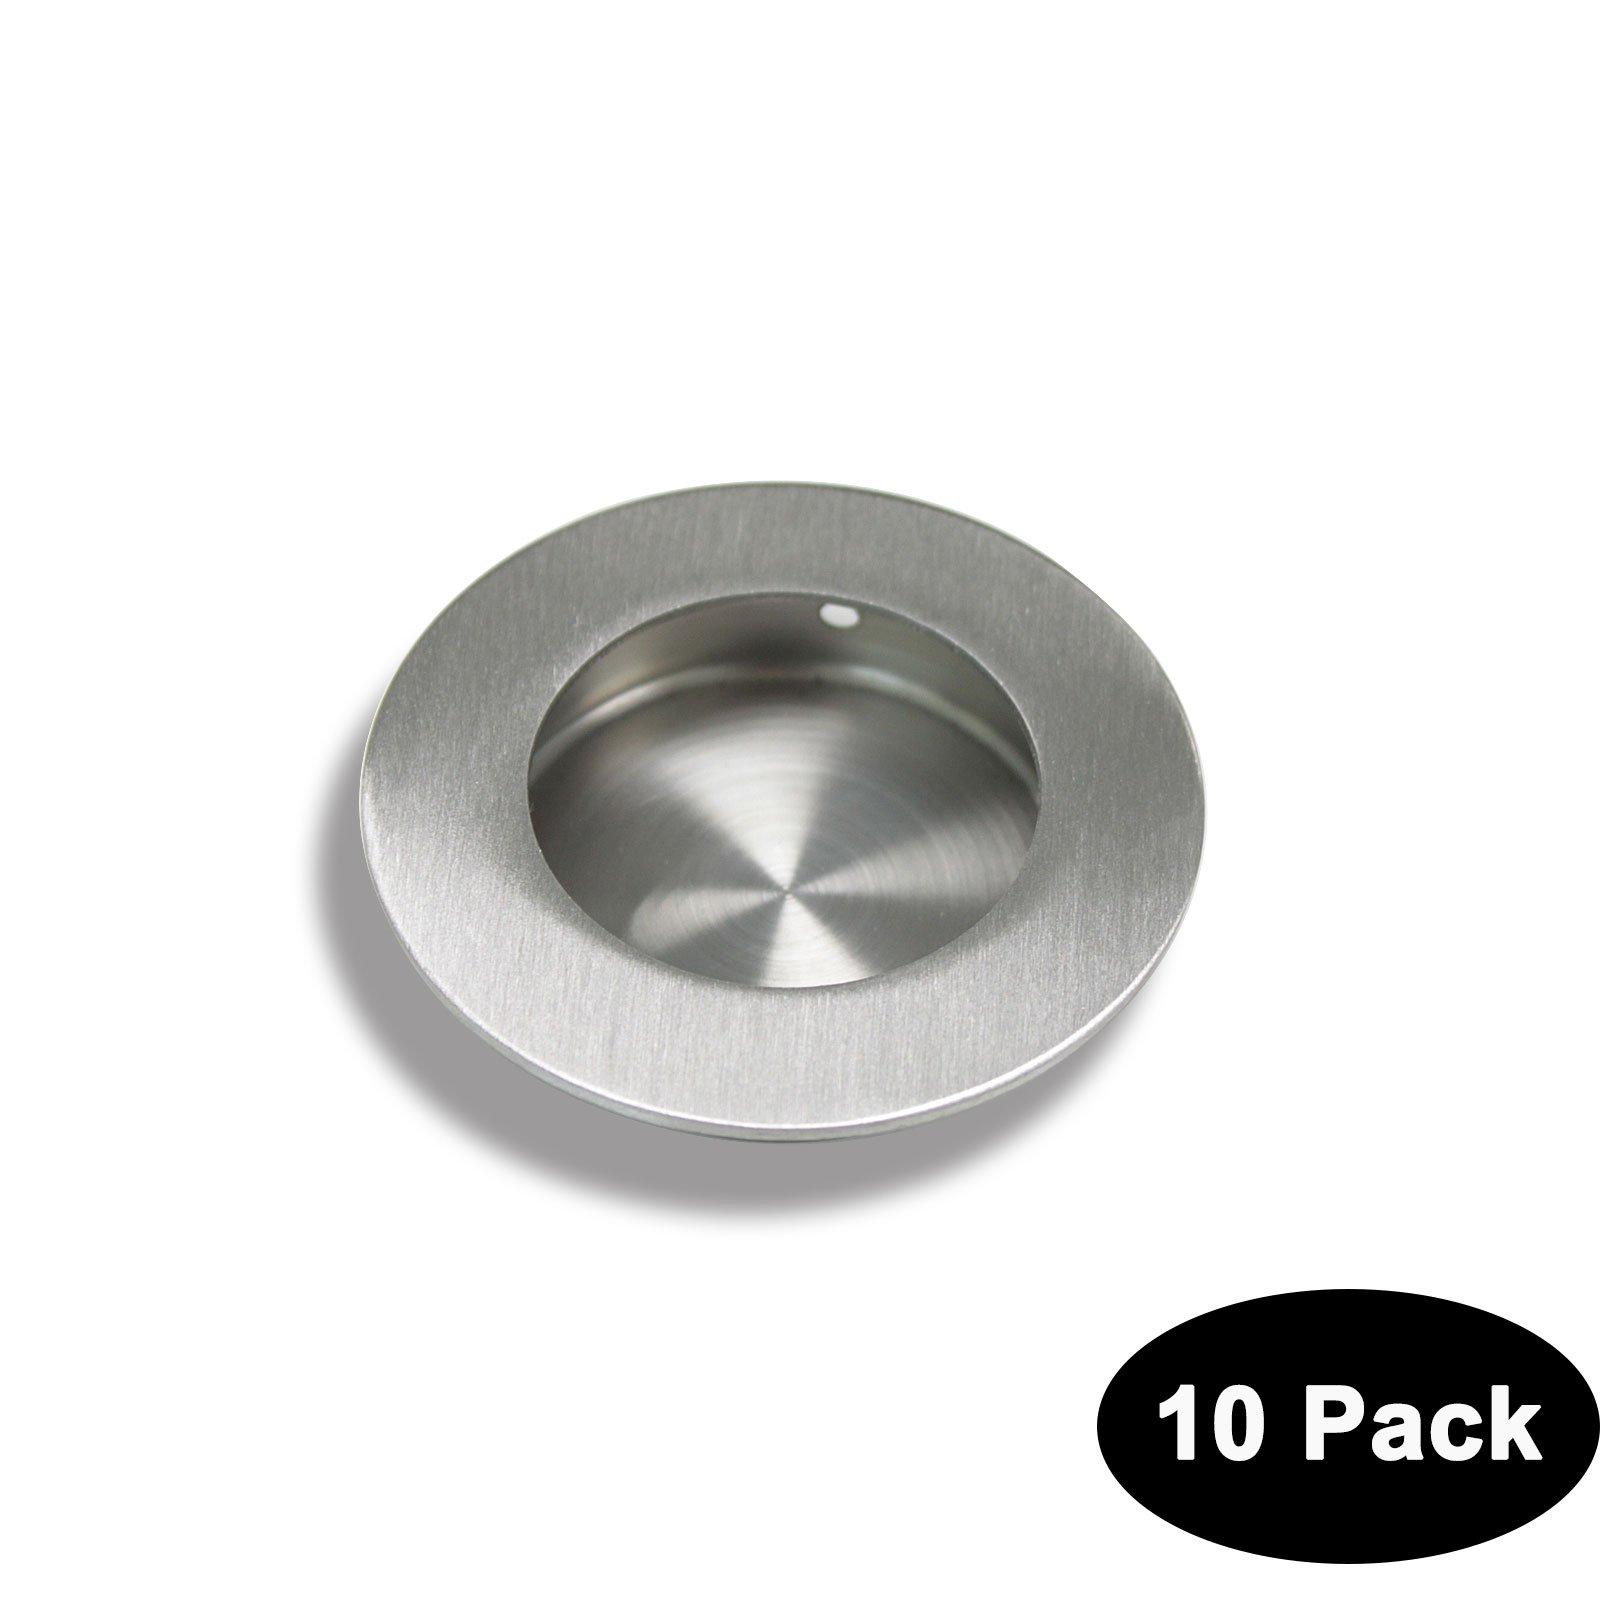 Circular Recessed Sliding Door Handles Round Flush Finger Pulls Diameter:2-1/2 in Stainless Steel 10 Pack